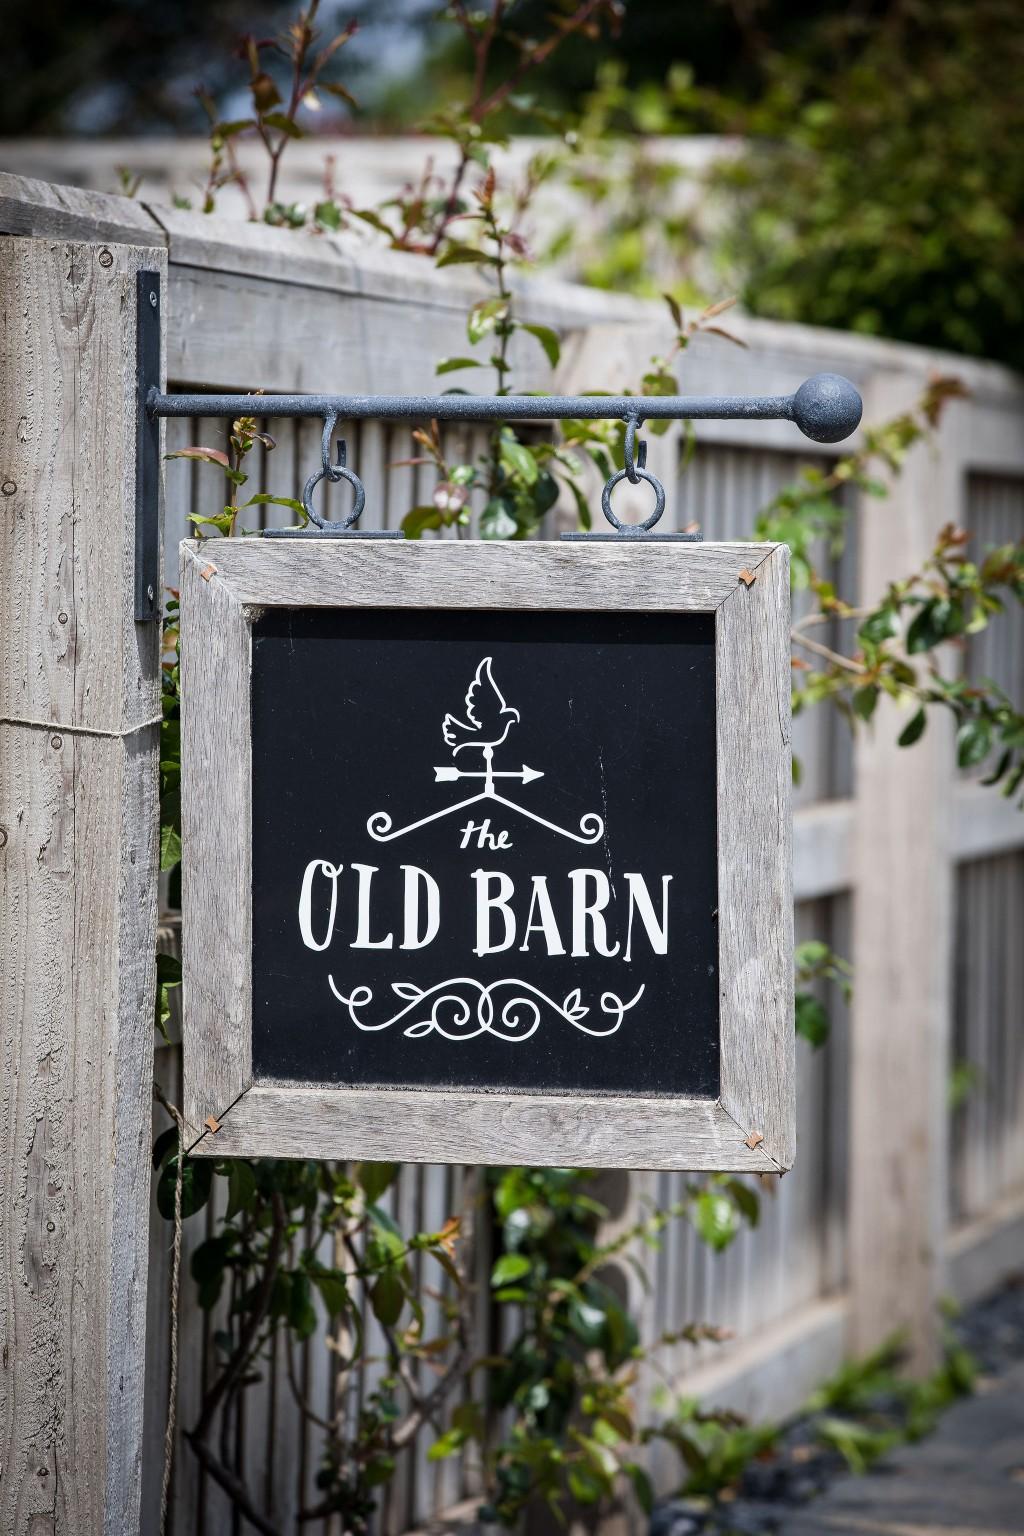 Harriet&Rhys Wedding - the old barn wedding venue devon